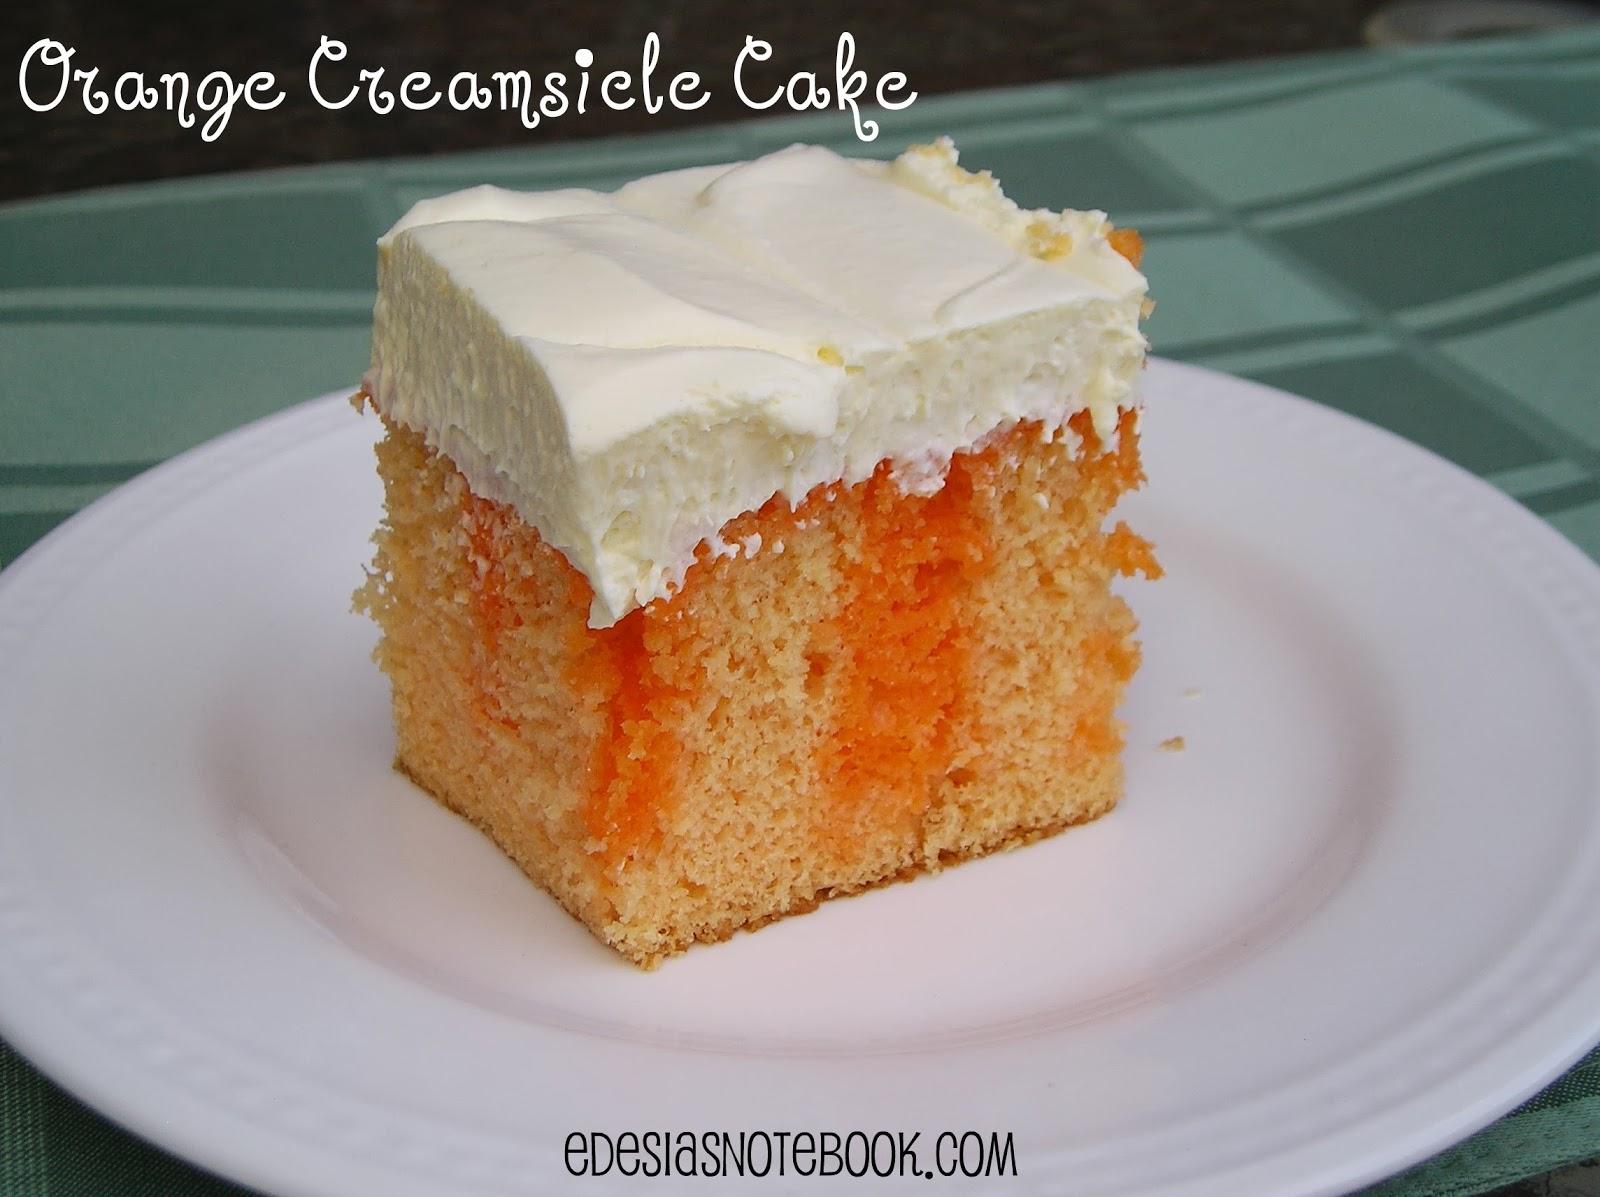 Orange Creamsicle Cake Recipe Duncan Hines